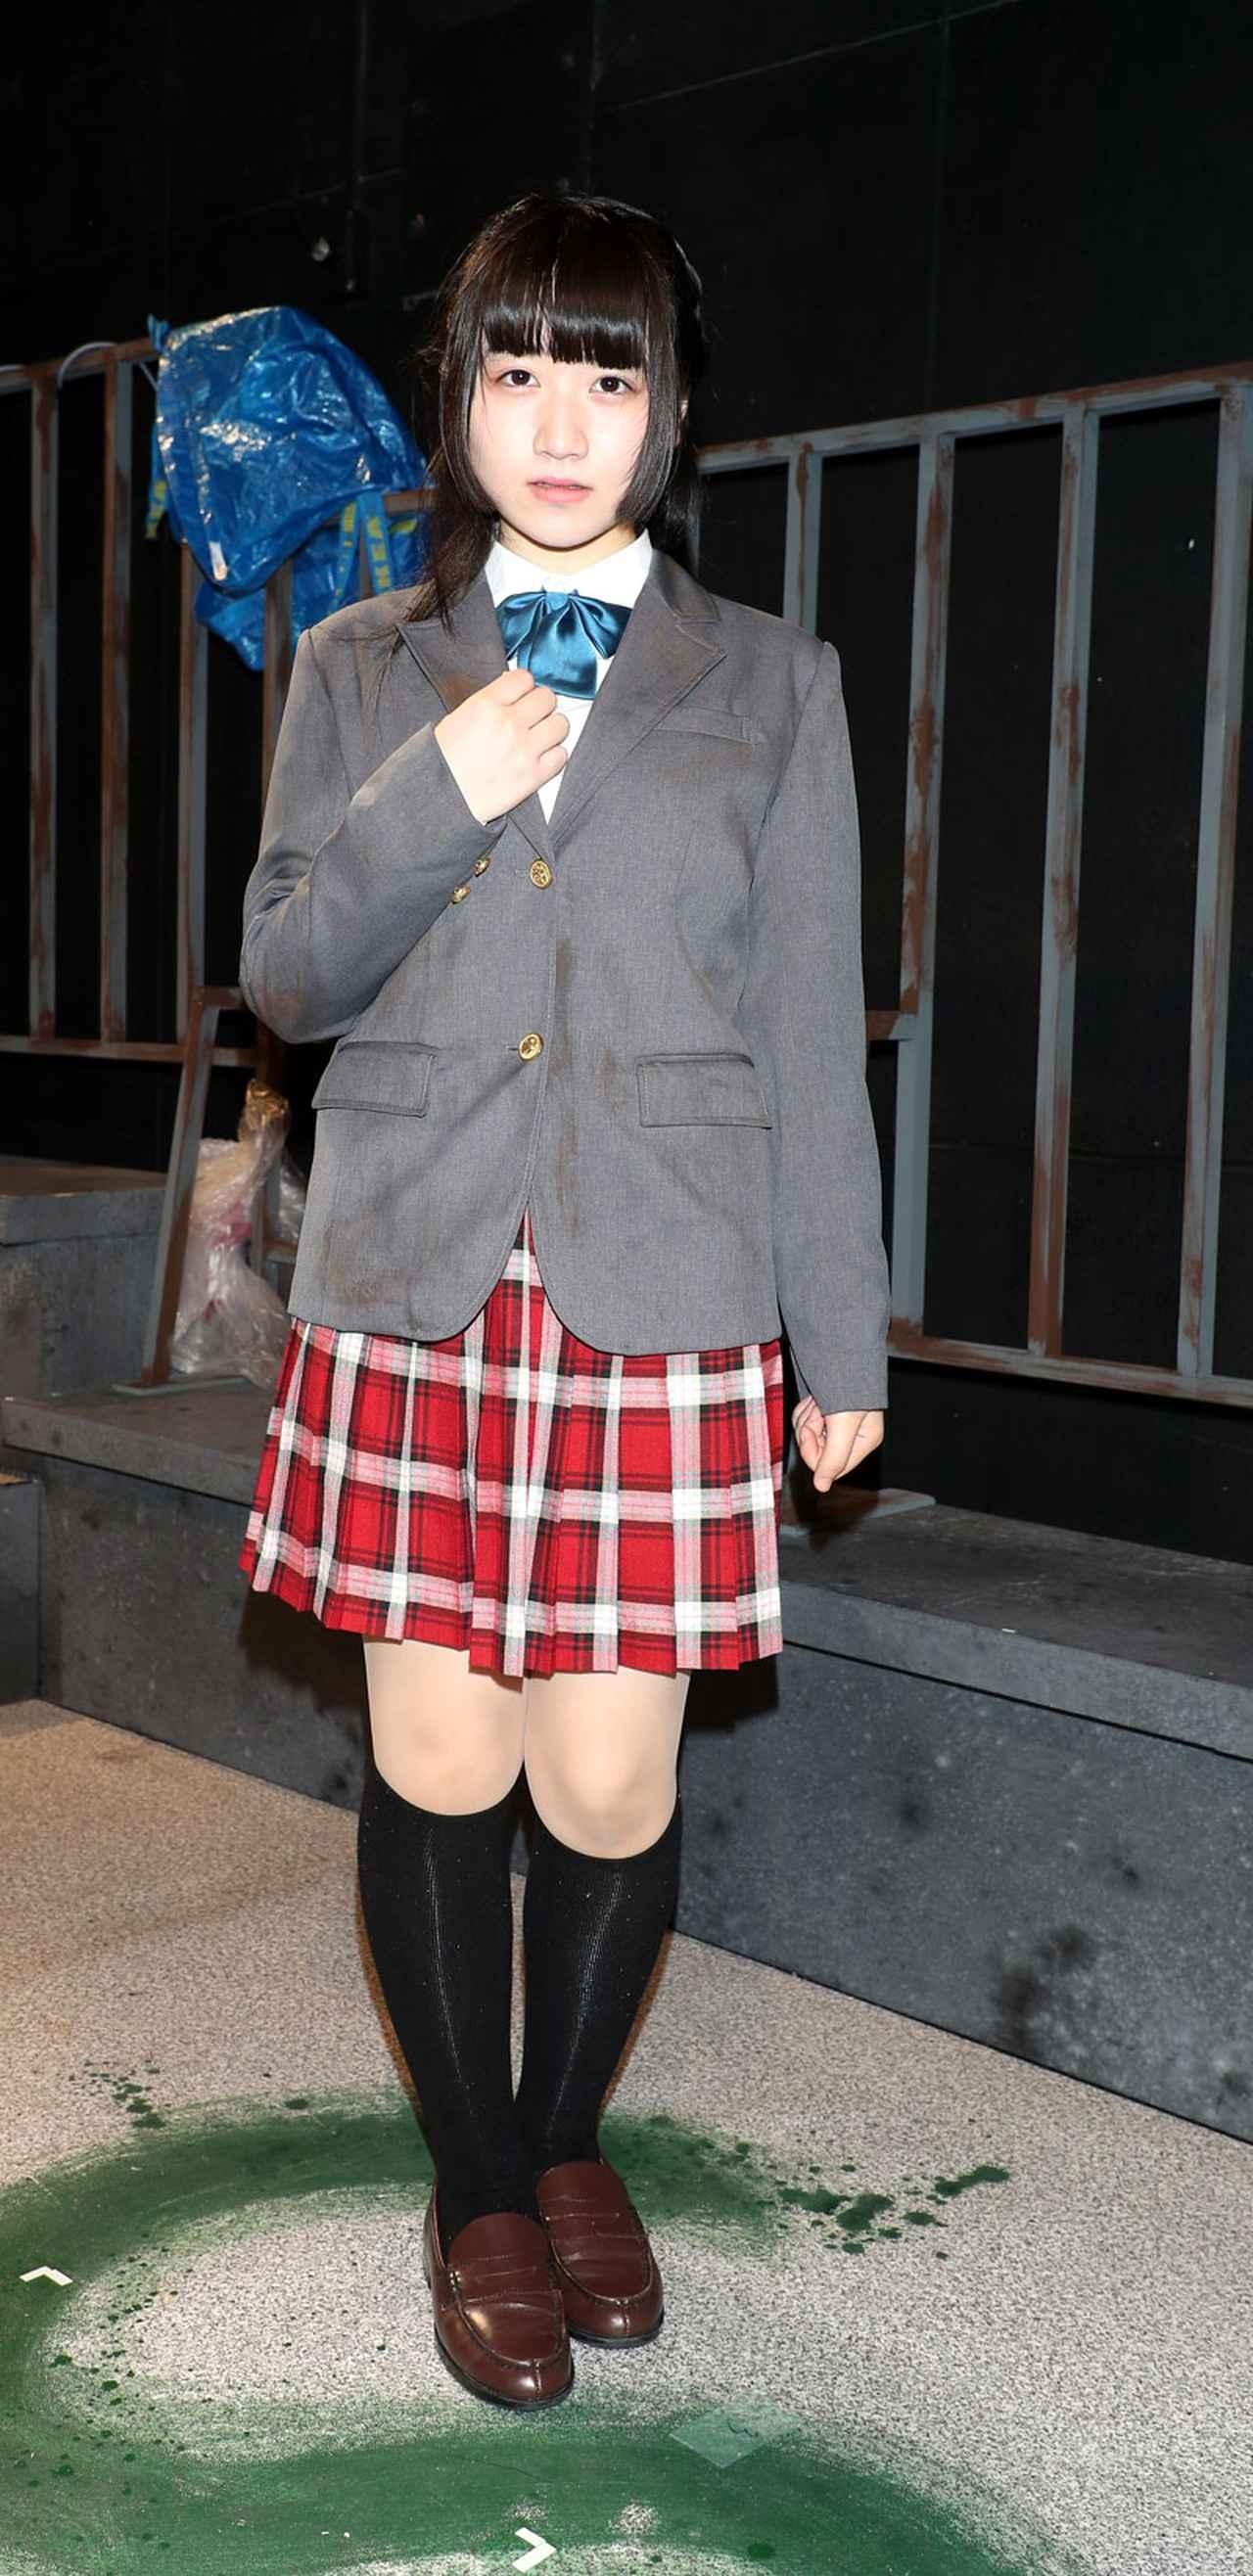 Images : 4番目の画像 - 「花岡芽佳、秋吉あき/アリスインプロジェクト最新作「最果ての星」で可憐な美少女を熱演!」のアルバム - Stereo Sound ONLINE